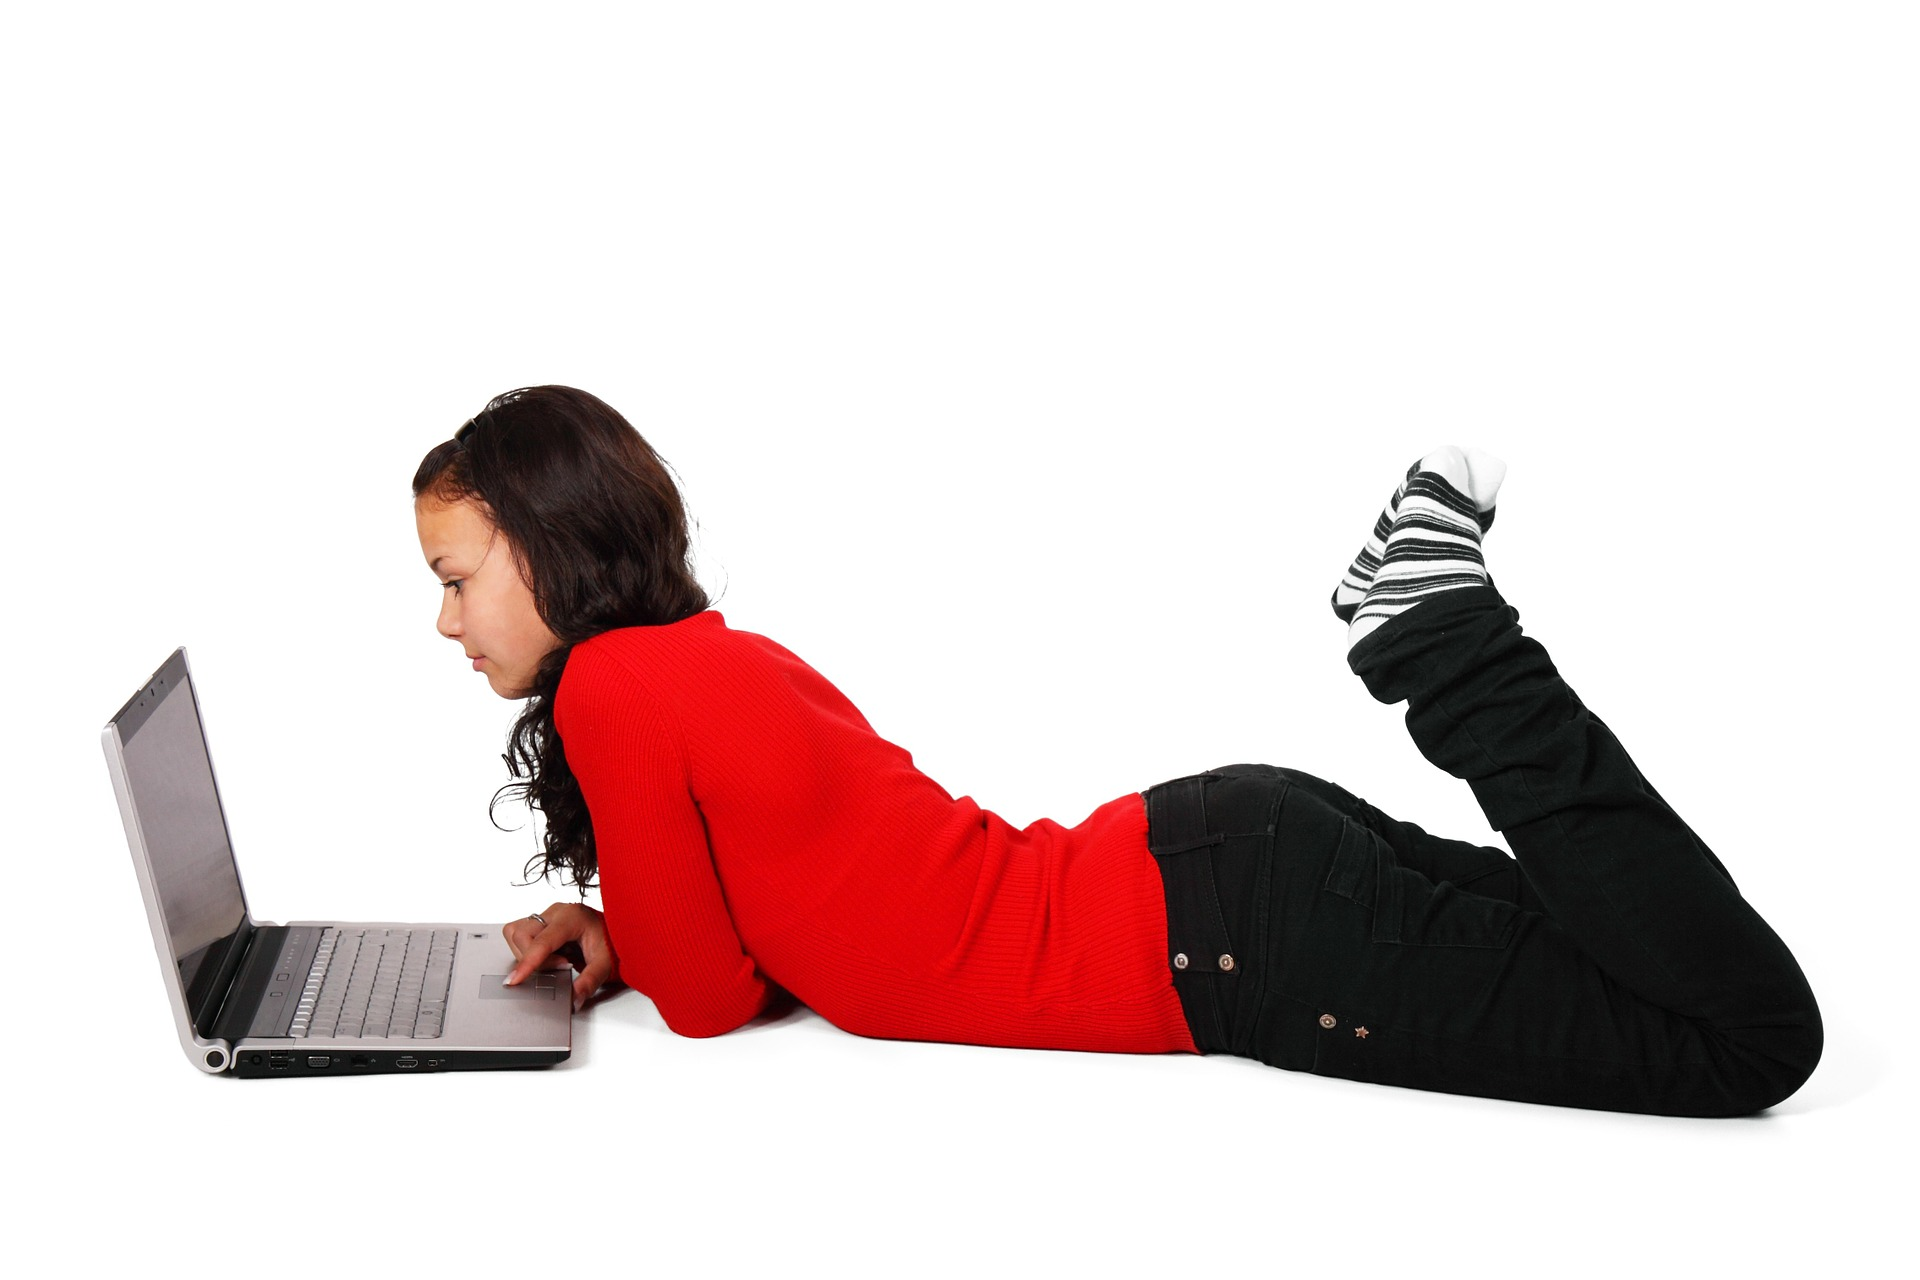 Besparelser rammer studiekvaliteten